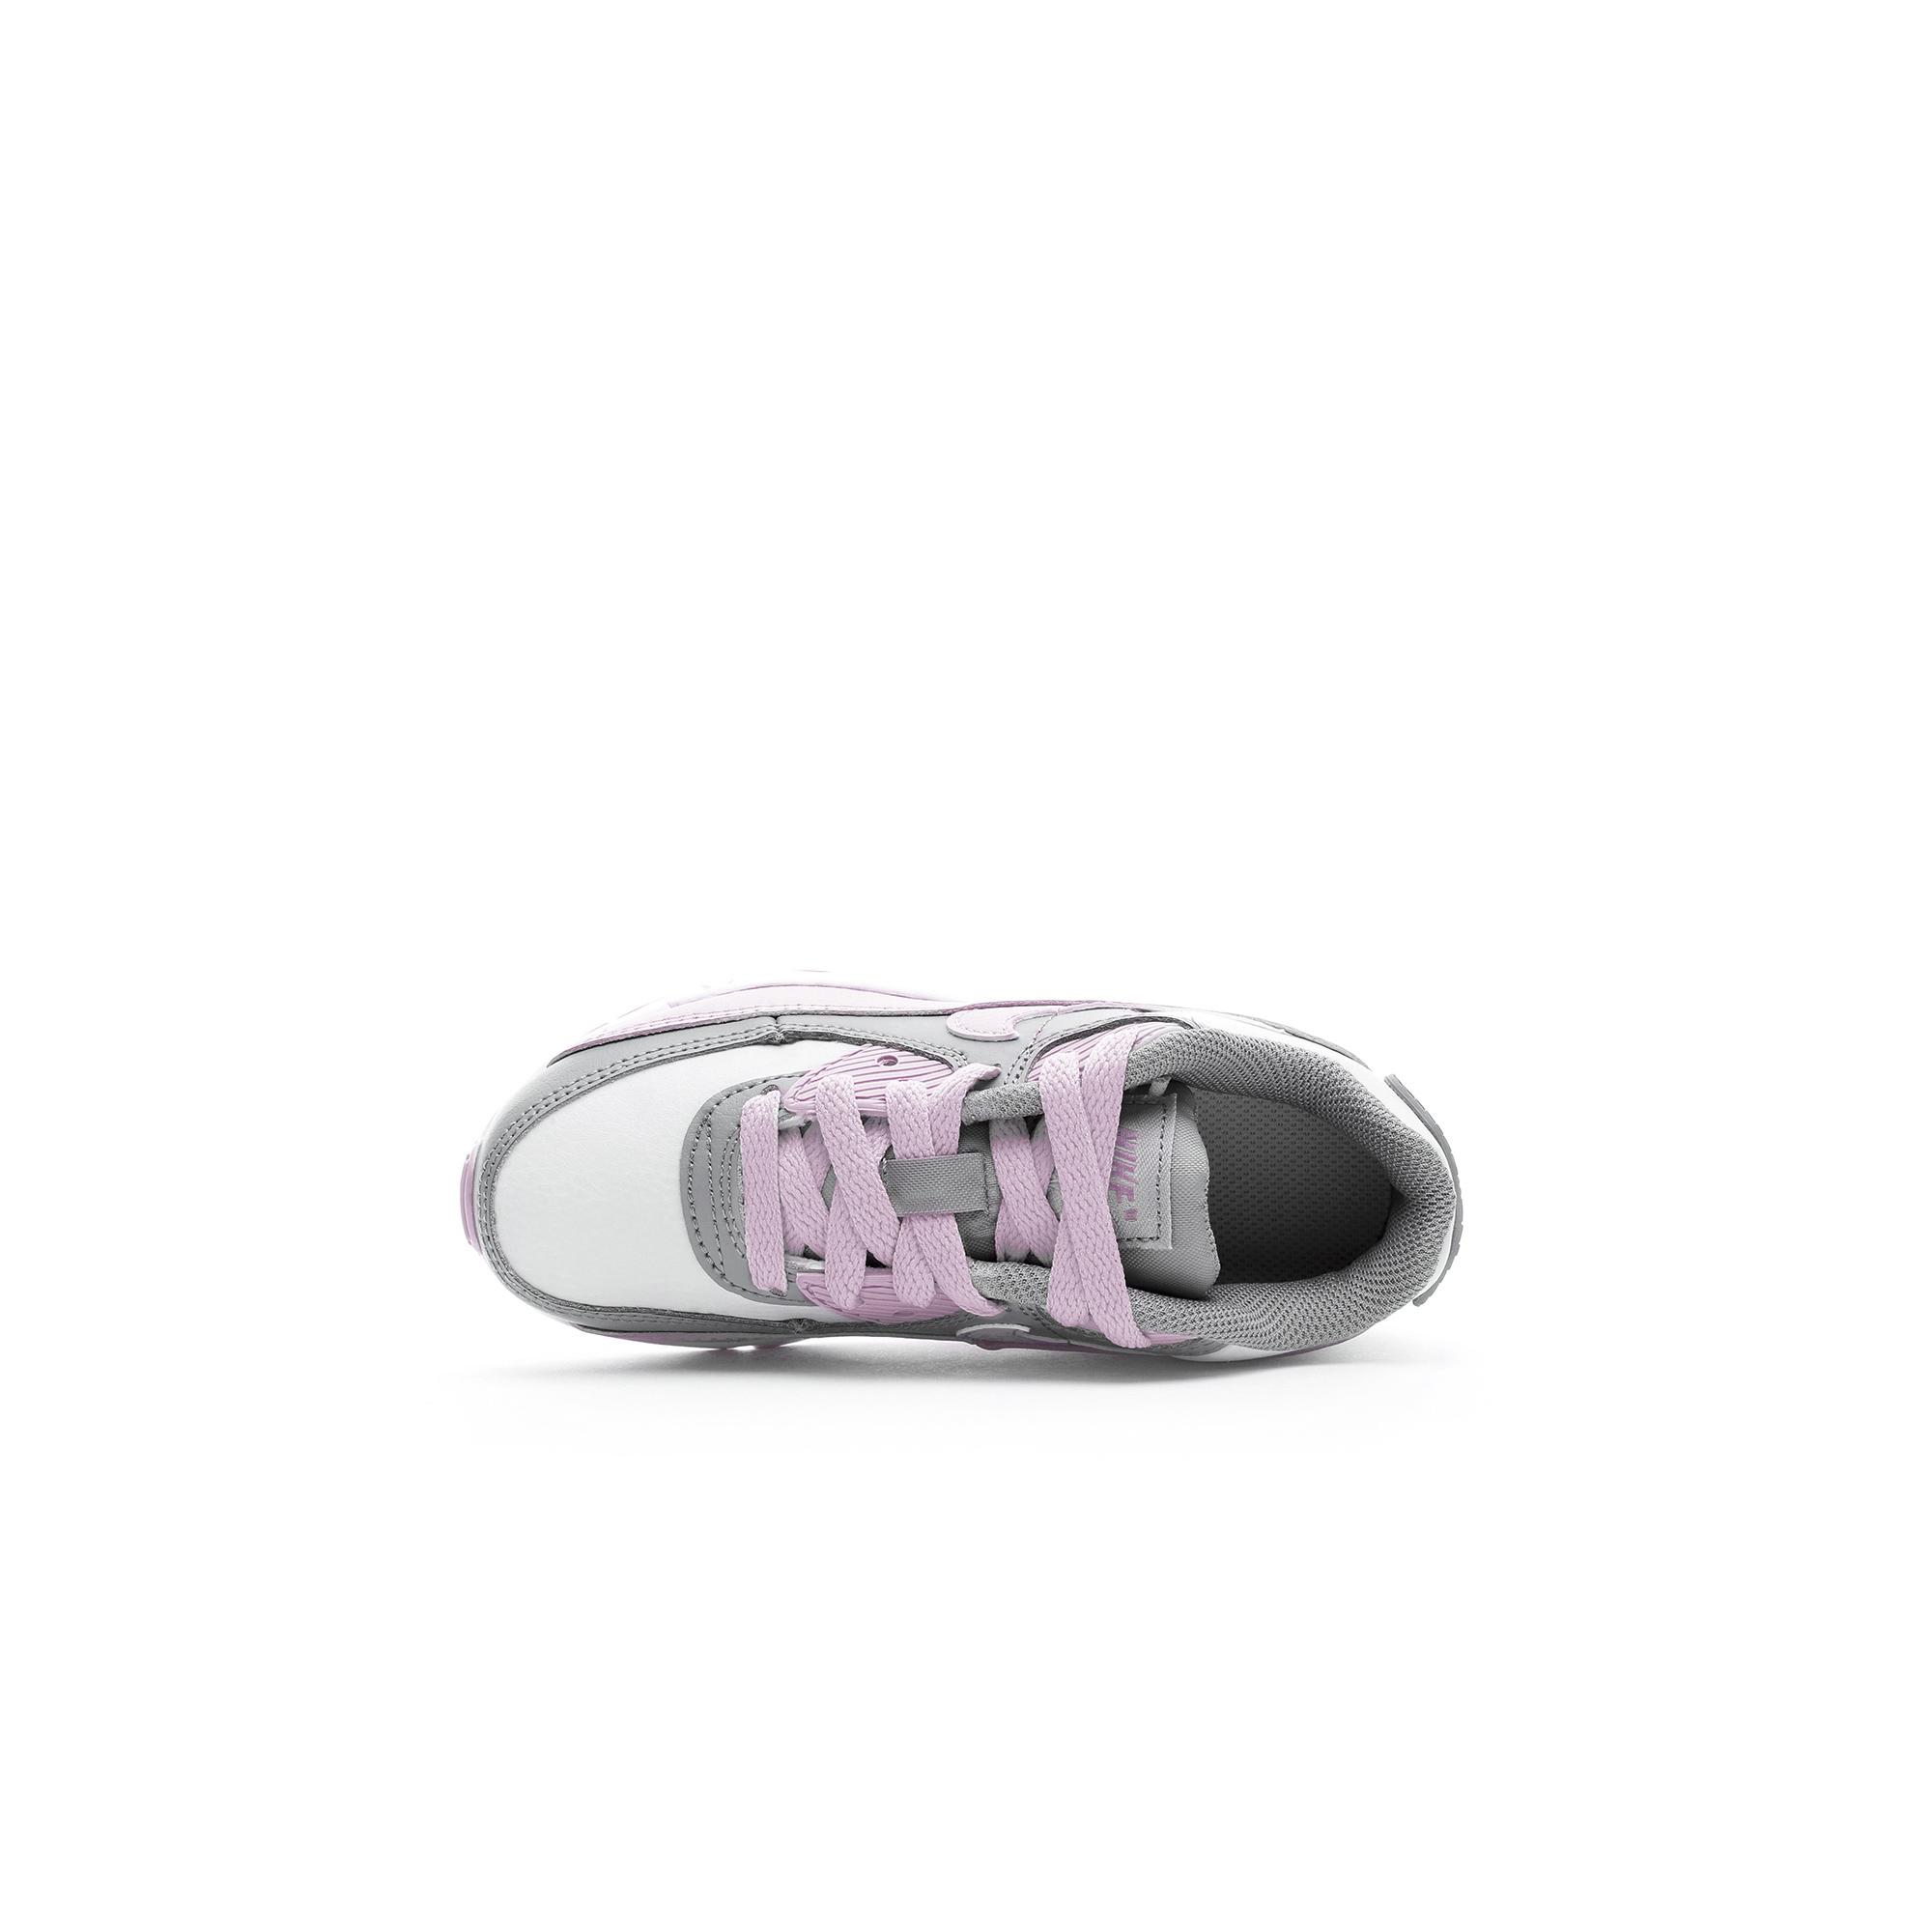 Nike Air Max 90 LTR Çocuk Pembe-Gri Spor Ayakkabı